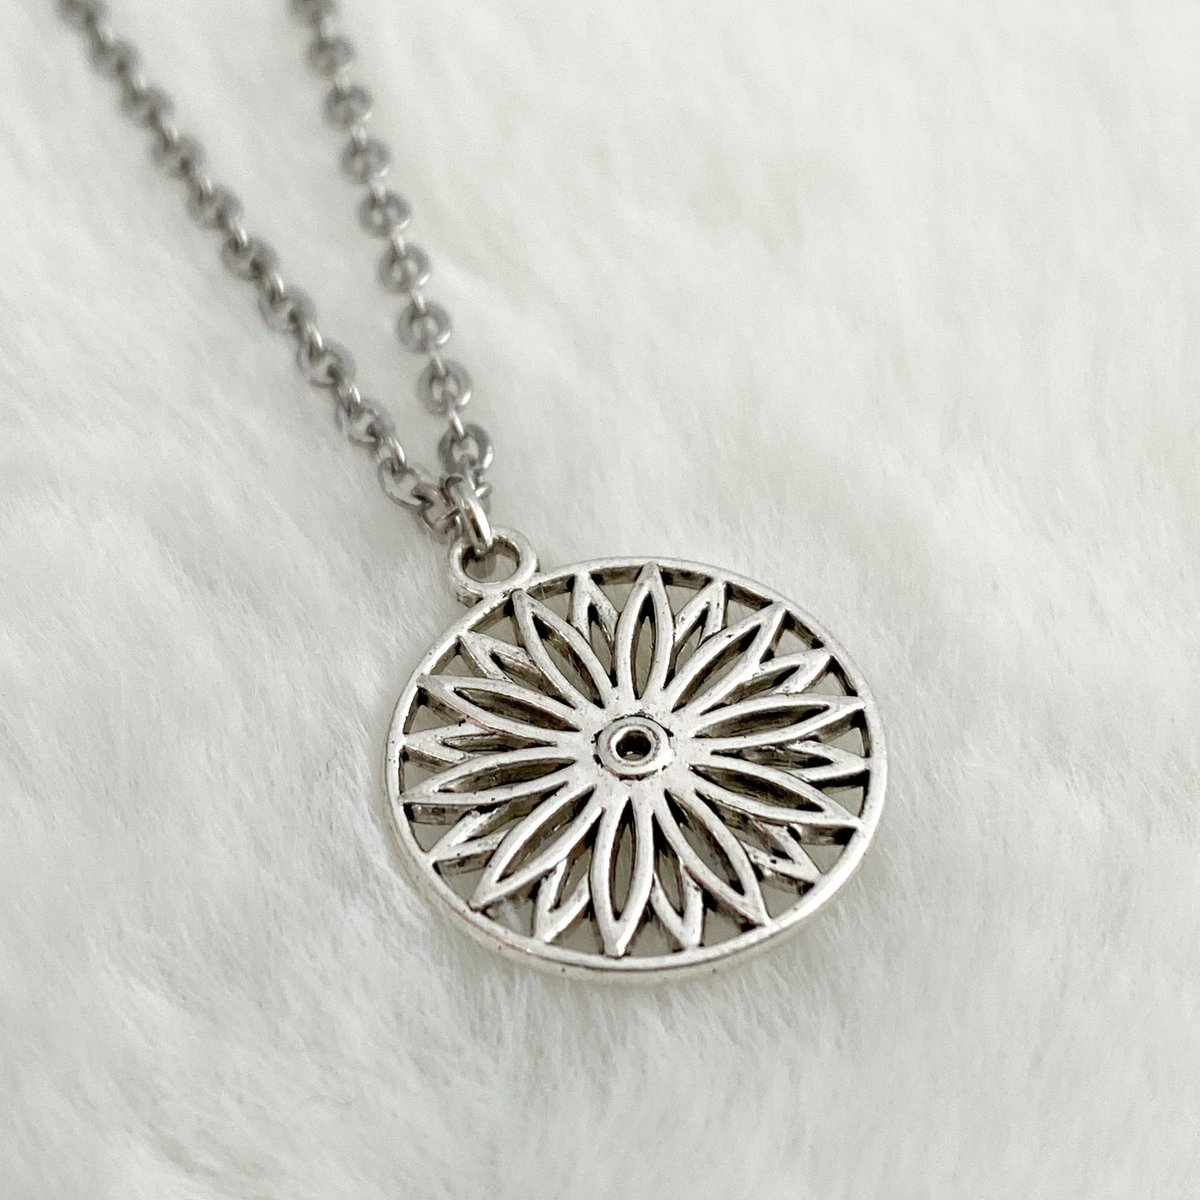 #RT @monalaina: Flower Charm Necklace, Silver Chain Necklace, Minimalist Necklace, Boho Floral Necklace, Bohemian Style, S321  #SmallBusiness #GiftforHer #EtsyJewelry #EtsyShop #Handmade #Jewelry #FreeShipping #Earrings #ChainNeck…